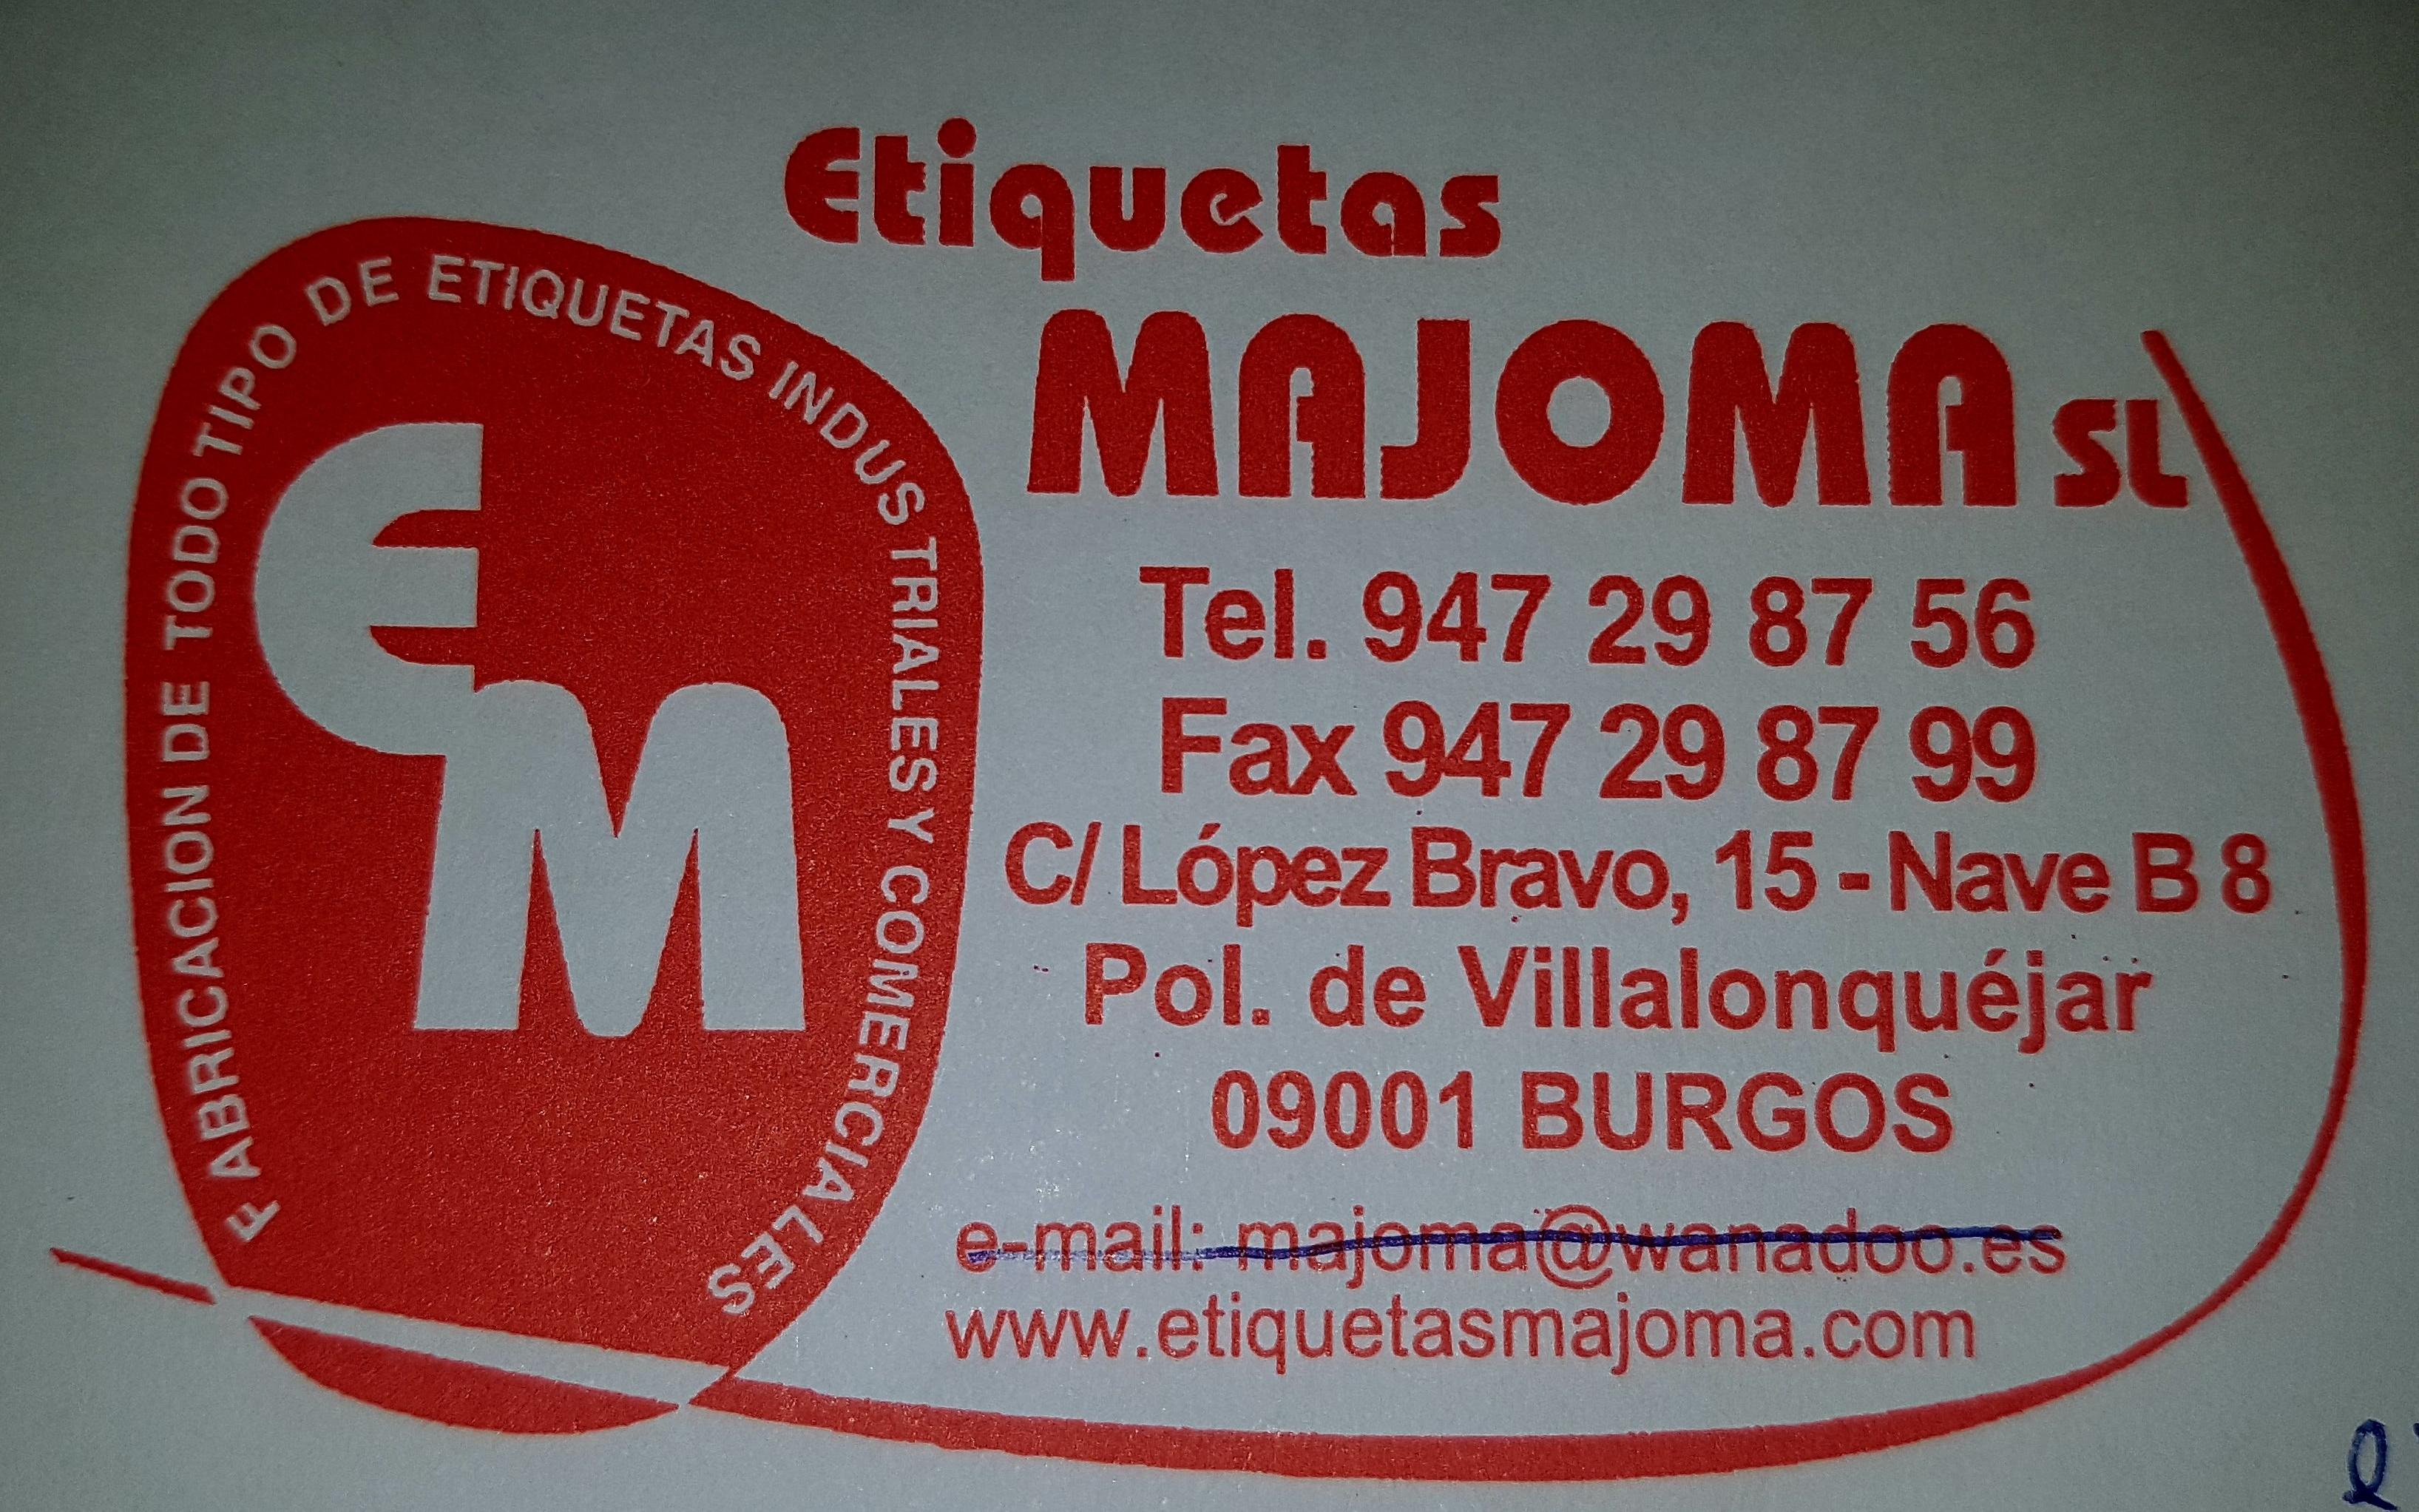 ETIQUETAS MAJOMA S.L.